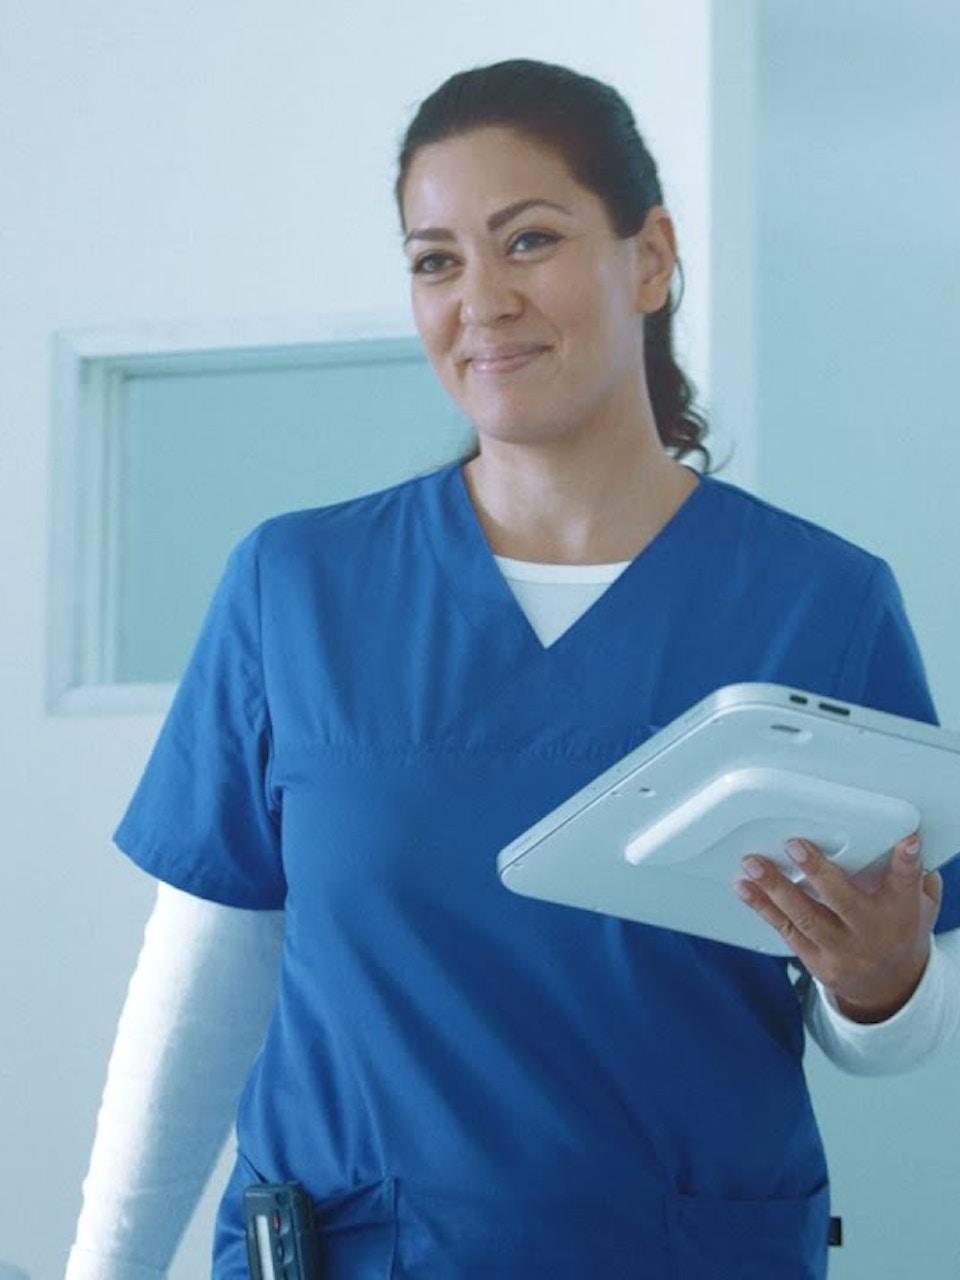 Siemens Healthineers – Somatom Go